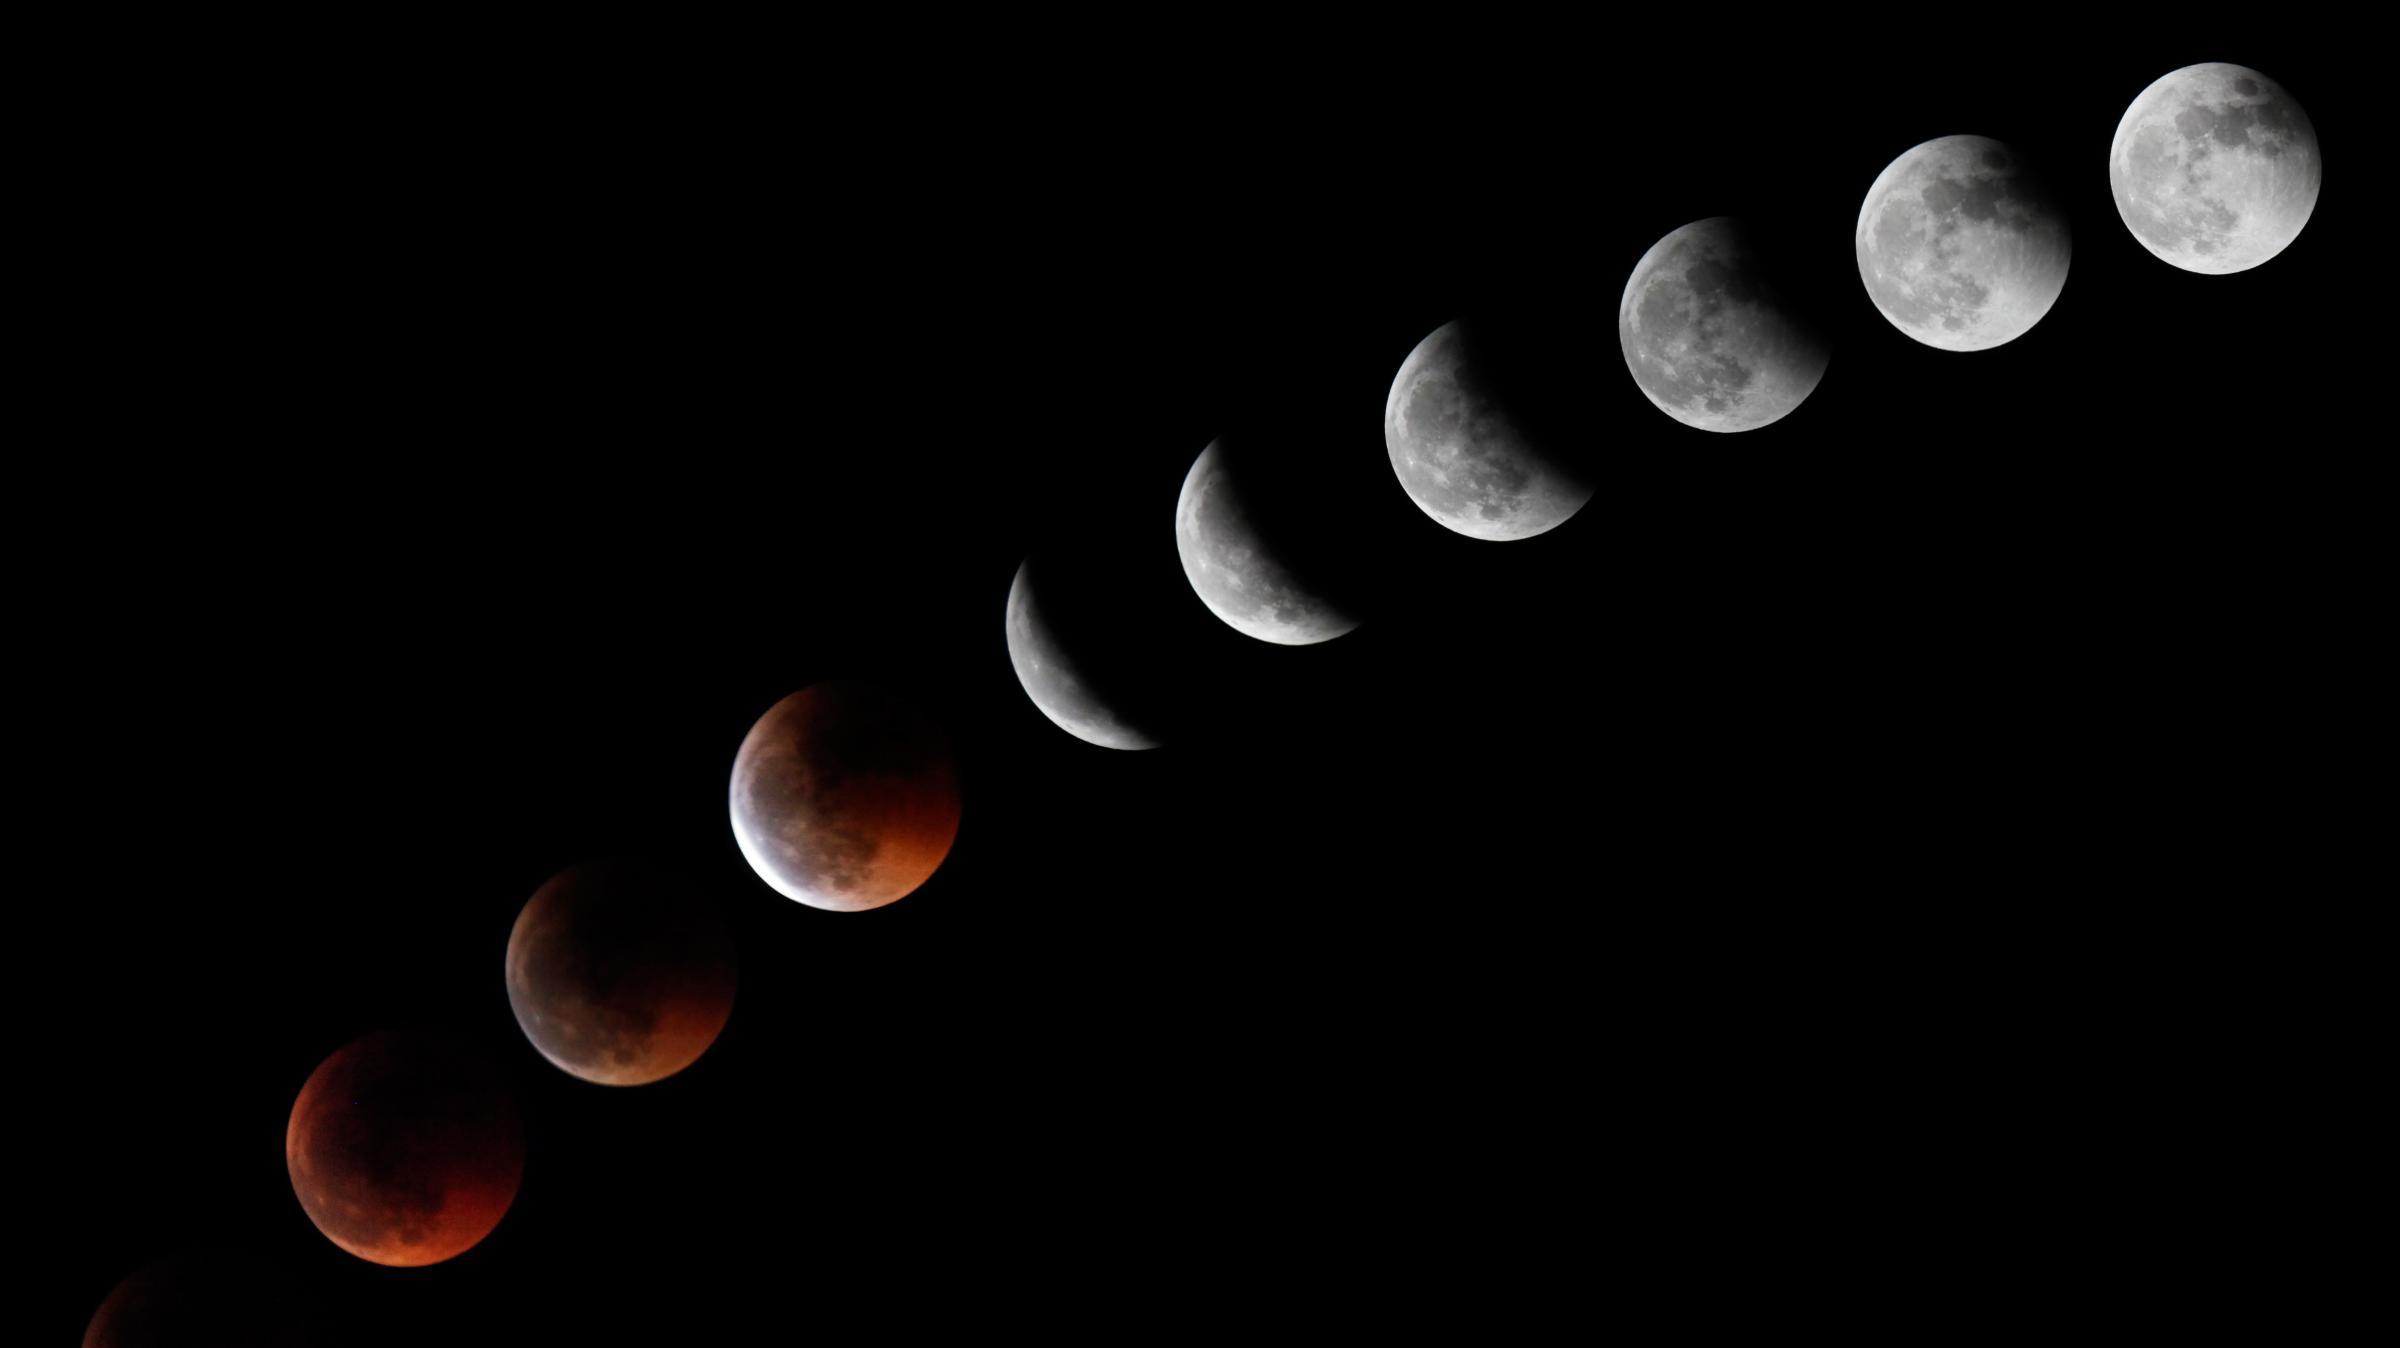 blood moon eclipse tonight time - photo #35